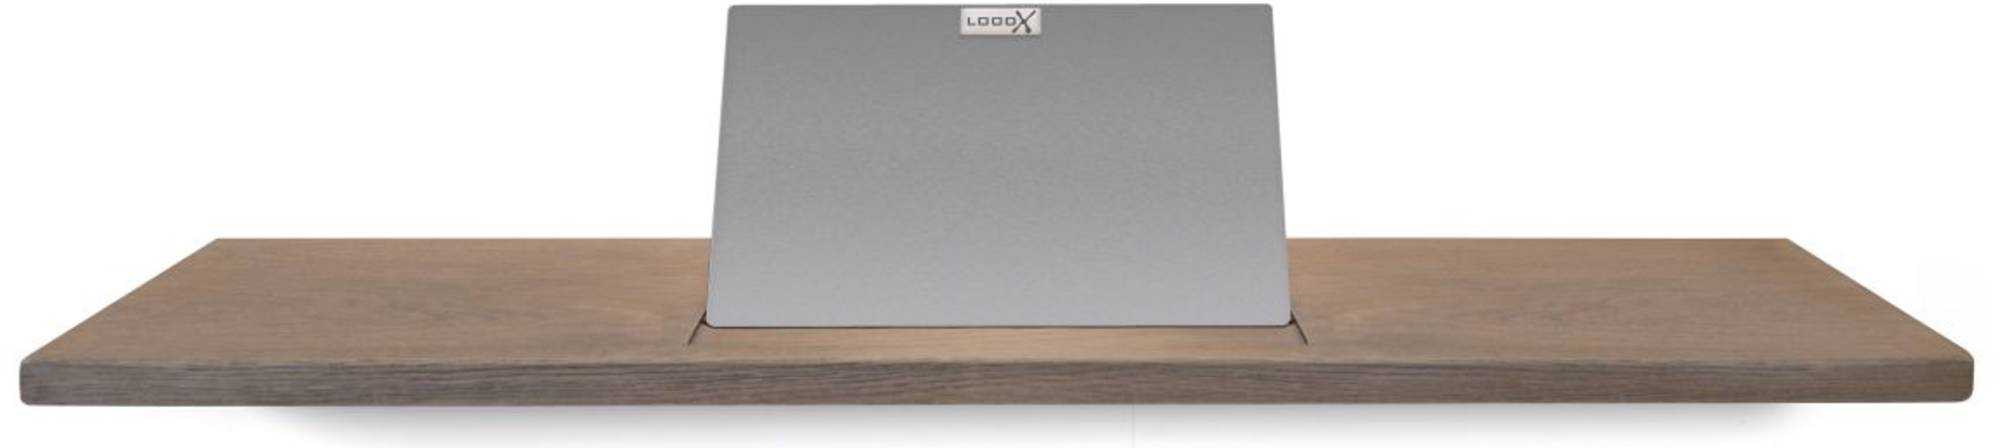 Looox Wooden Collection bath shelf met houder geborsteld rvs eiken/geborsteld rvs